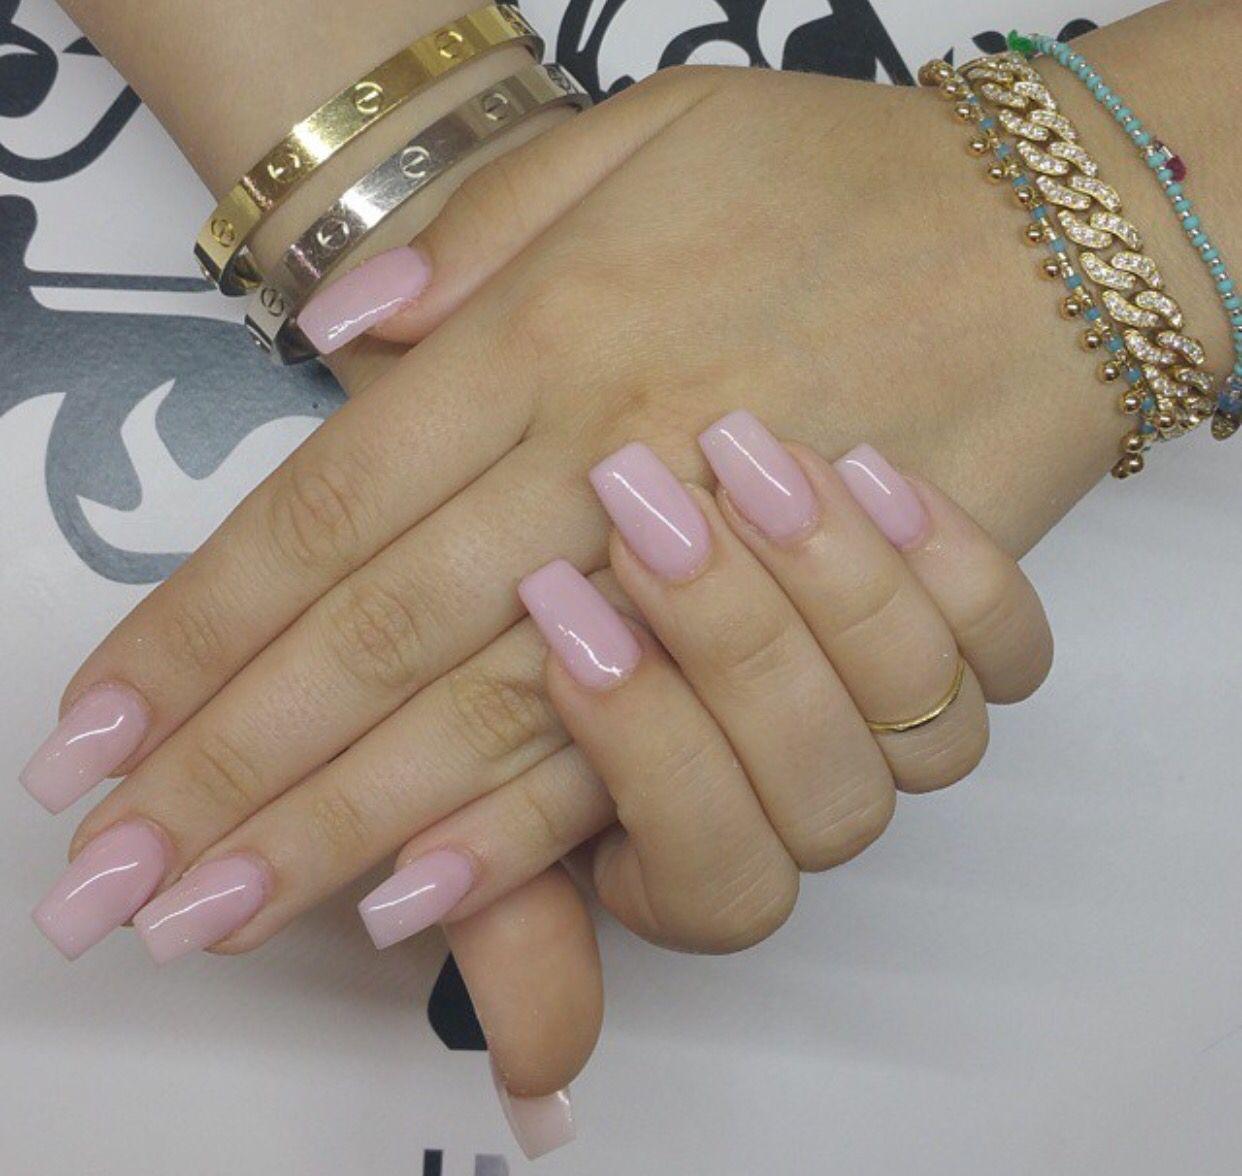 Light Pink Natural Color Nails Natural Acrylic Nails Short Coffin Nails Designs,Luxury Log Cabin Interior Design